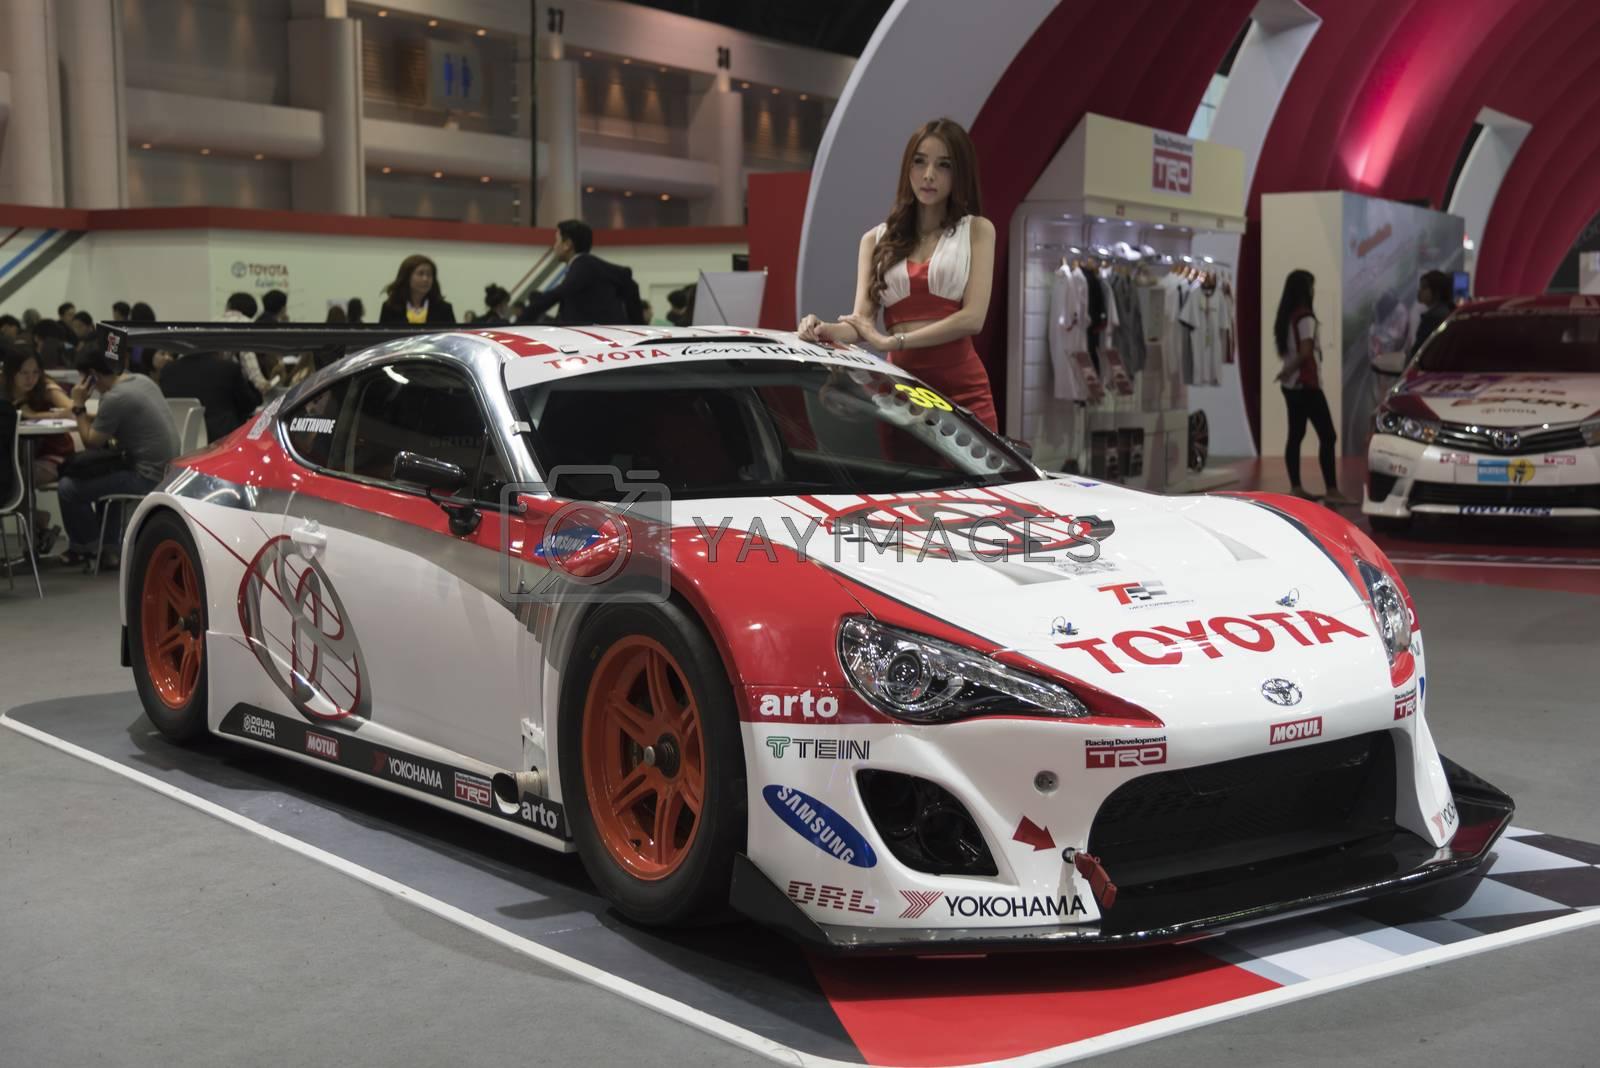 BANGKOK,THAILAND - APRIL 4 : toyota racing show on April 4,2015 at the 36th Bangkok international motor show in Thailand.